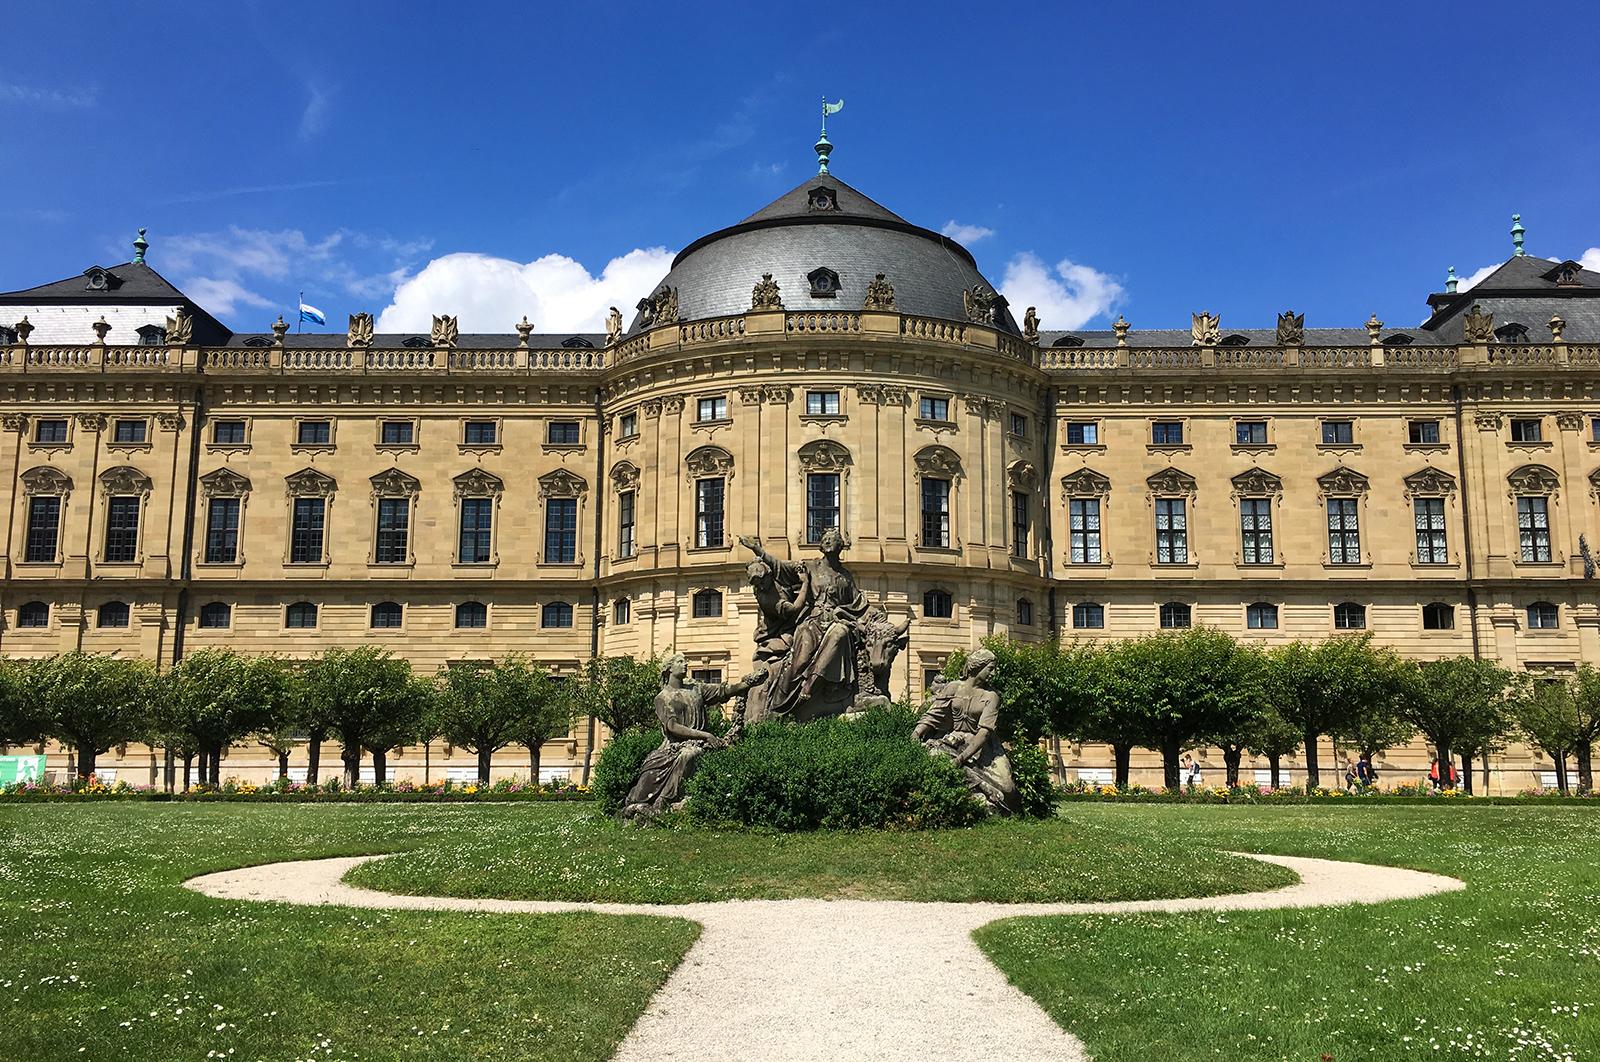 Residenz Würzburg - Würzburg Residence, view from inside the garden